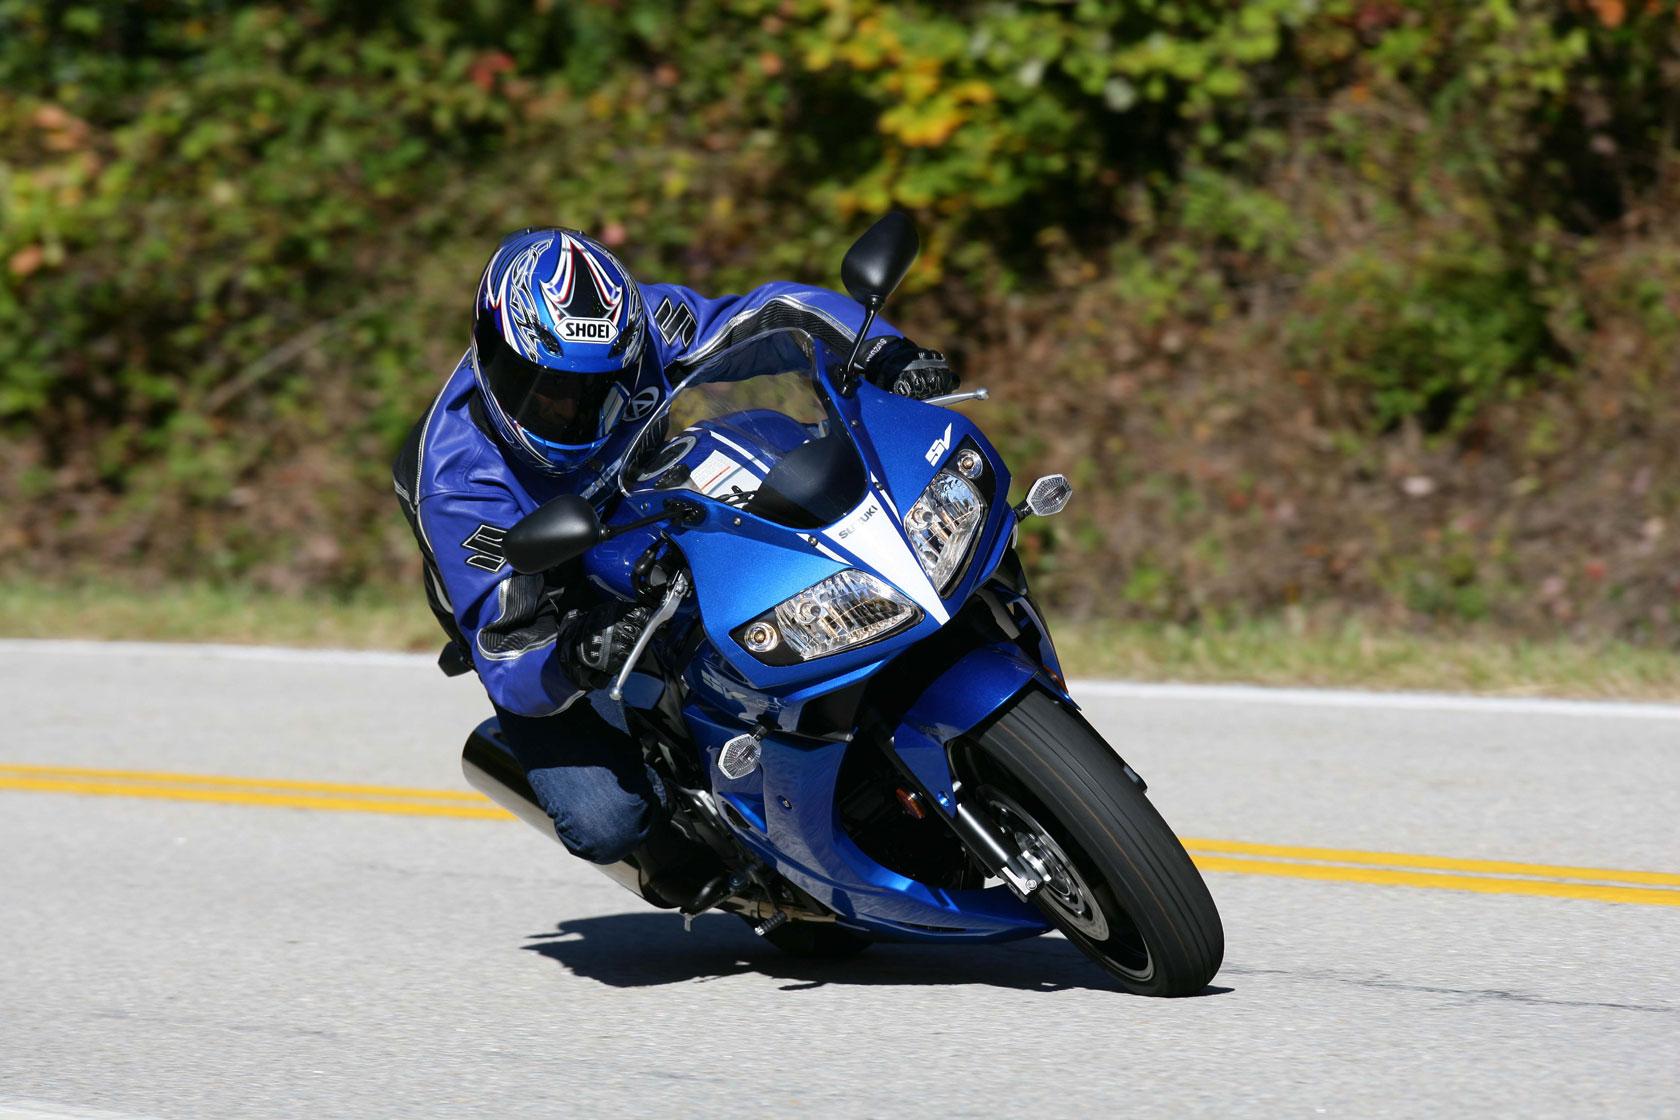 Тест-драйв мотоцикла Suzuki SV650